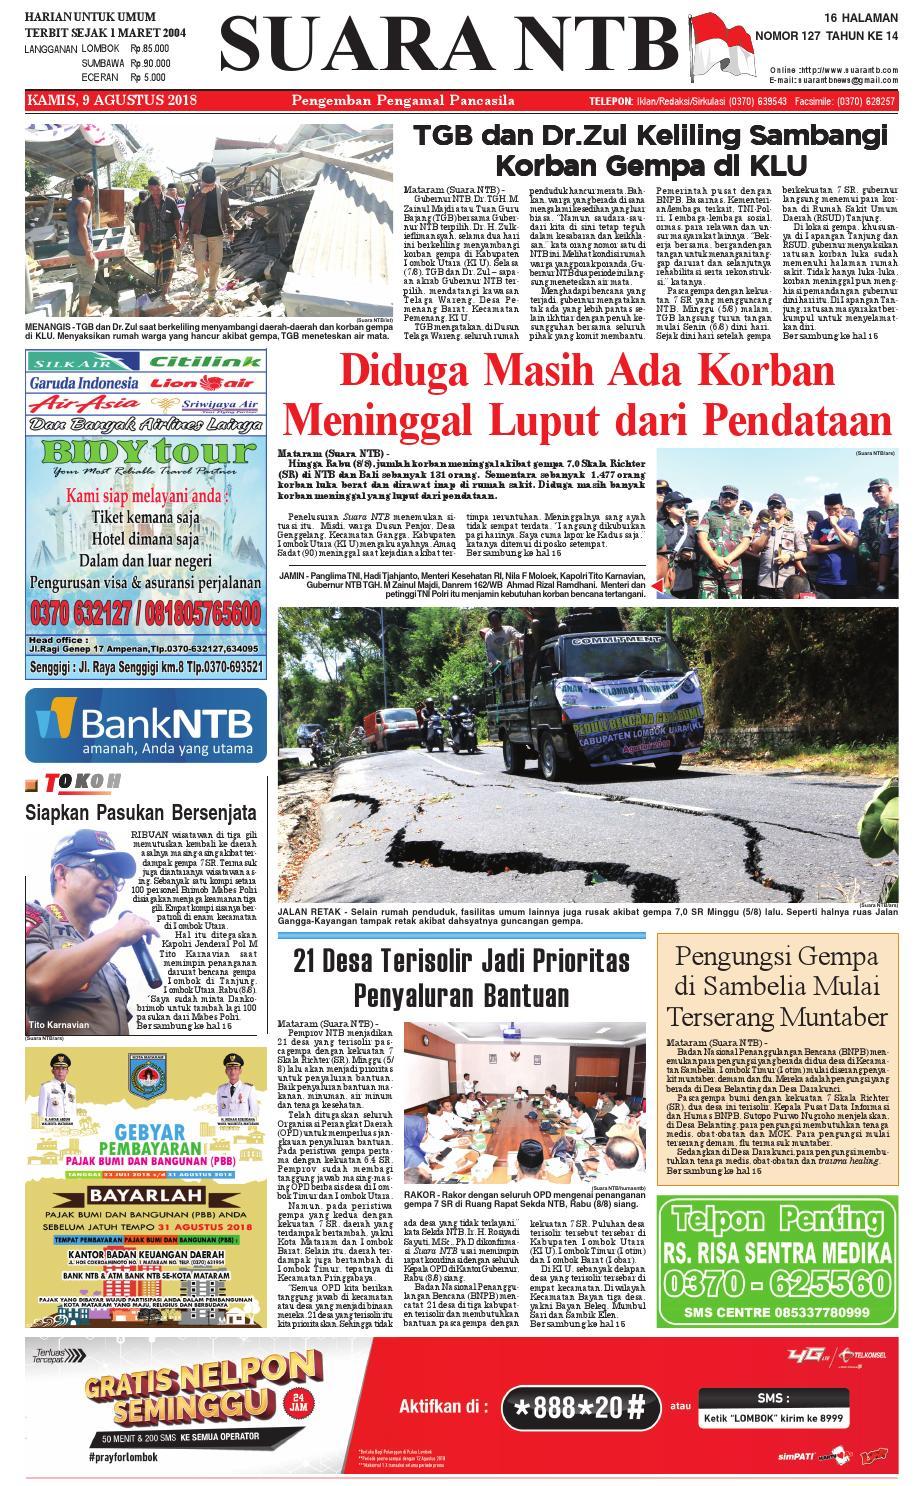 Edisi Kamis 9 Agustus 2018 Suara Ntb By E Paper Kmb Issuu Produk Ukm Bumn Wisata Mewah Bali 3hr 2mlm